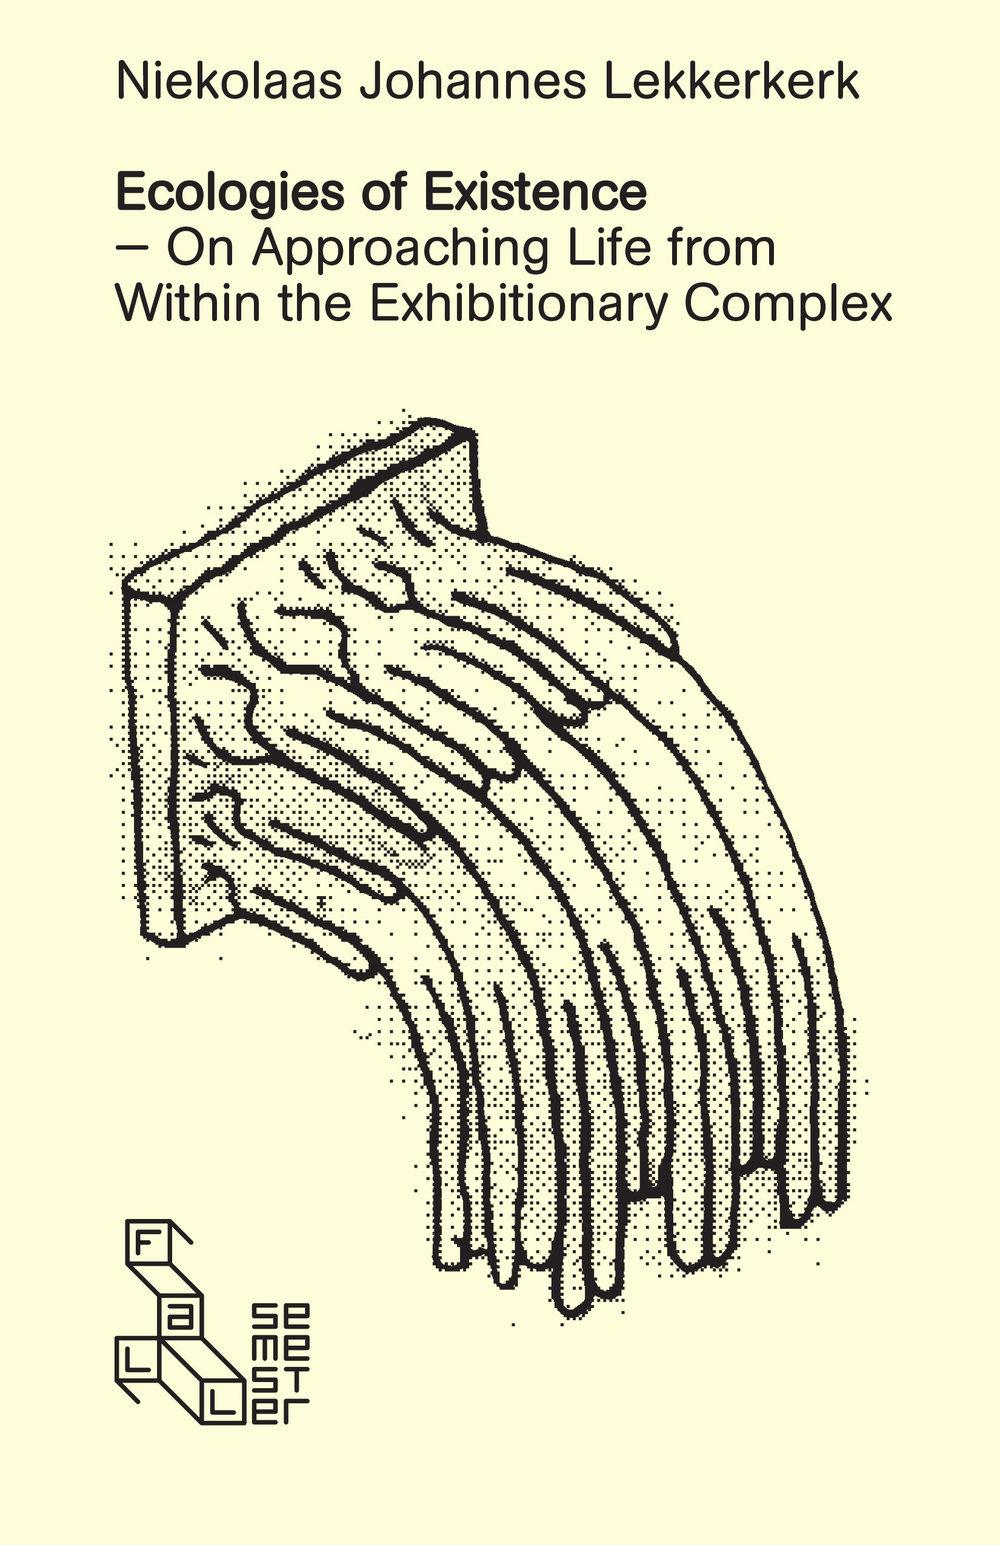 LEKKERKERK-Booklet-1.jpg